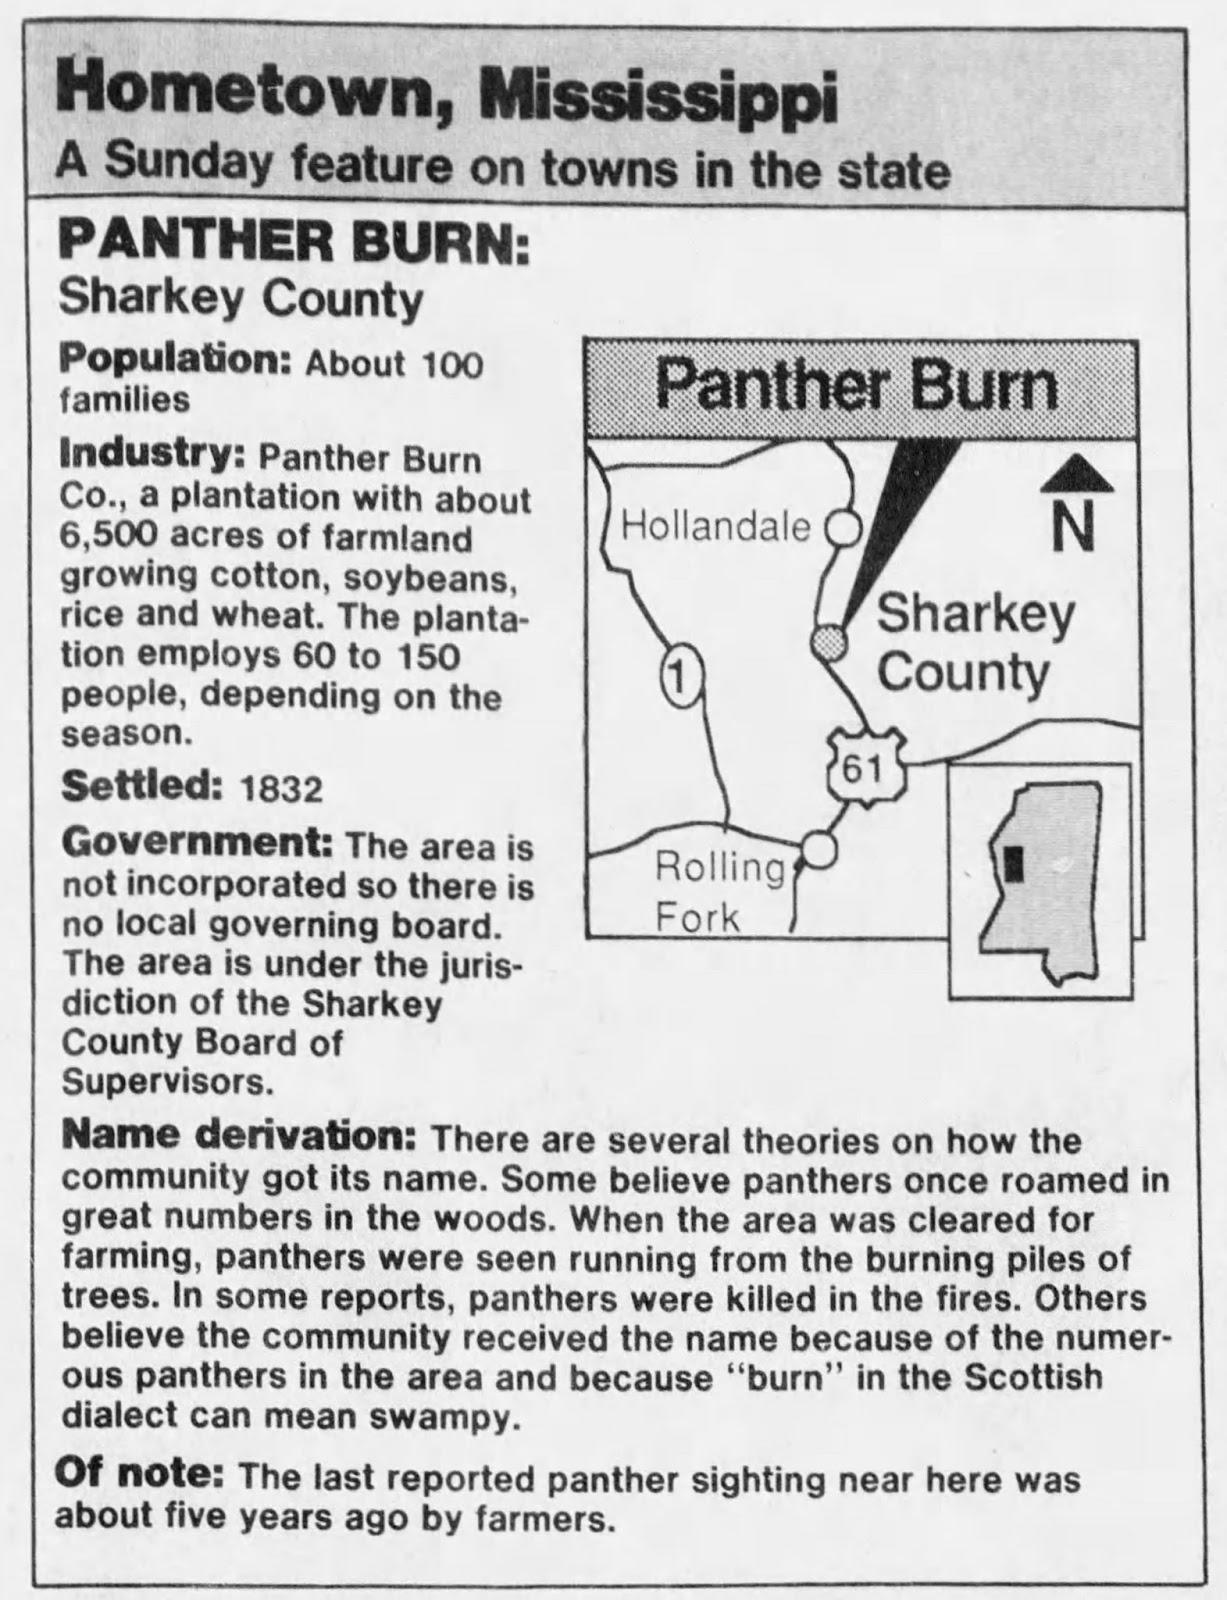 Mississippi washington county hollandale -  Jackson Ms Clarion Ledger Nov 1 1987